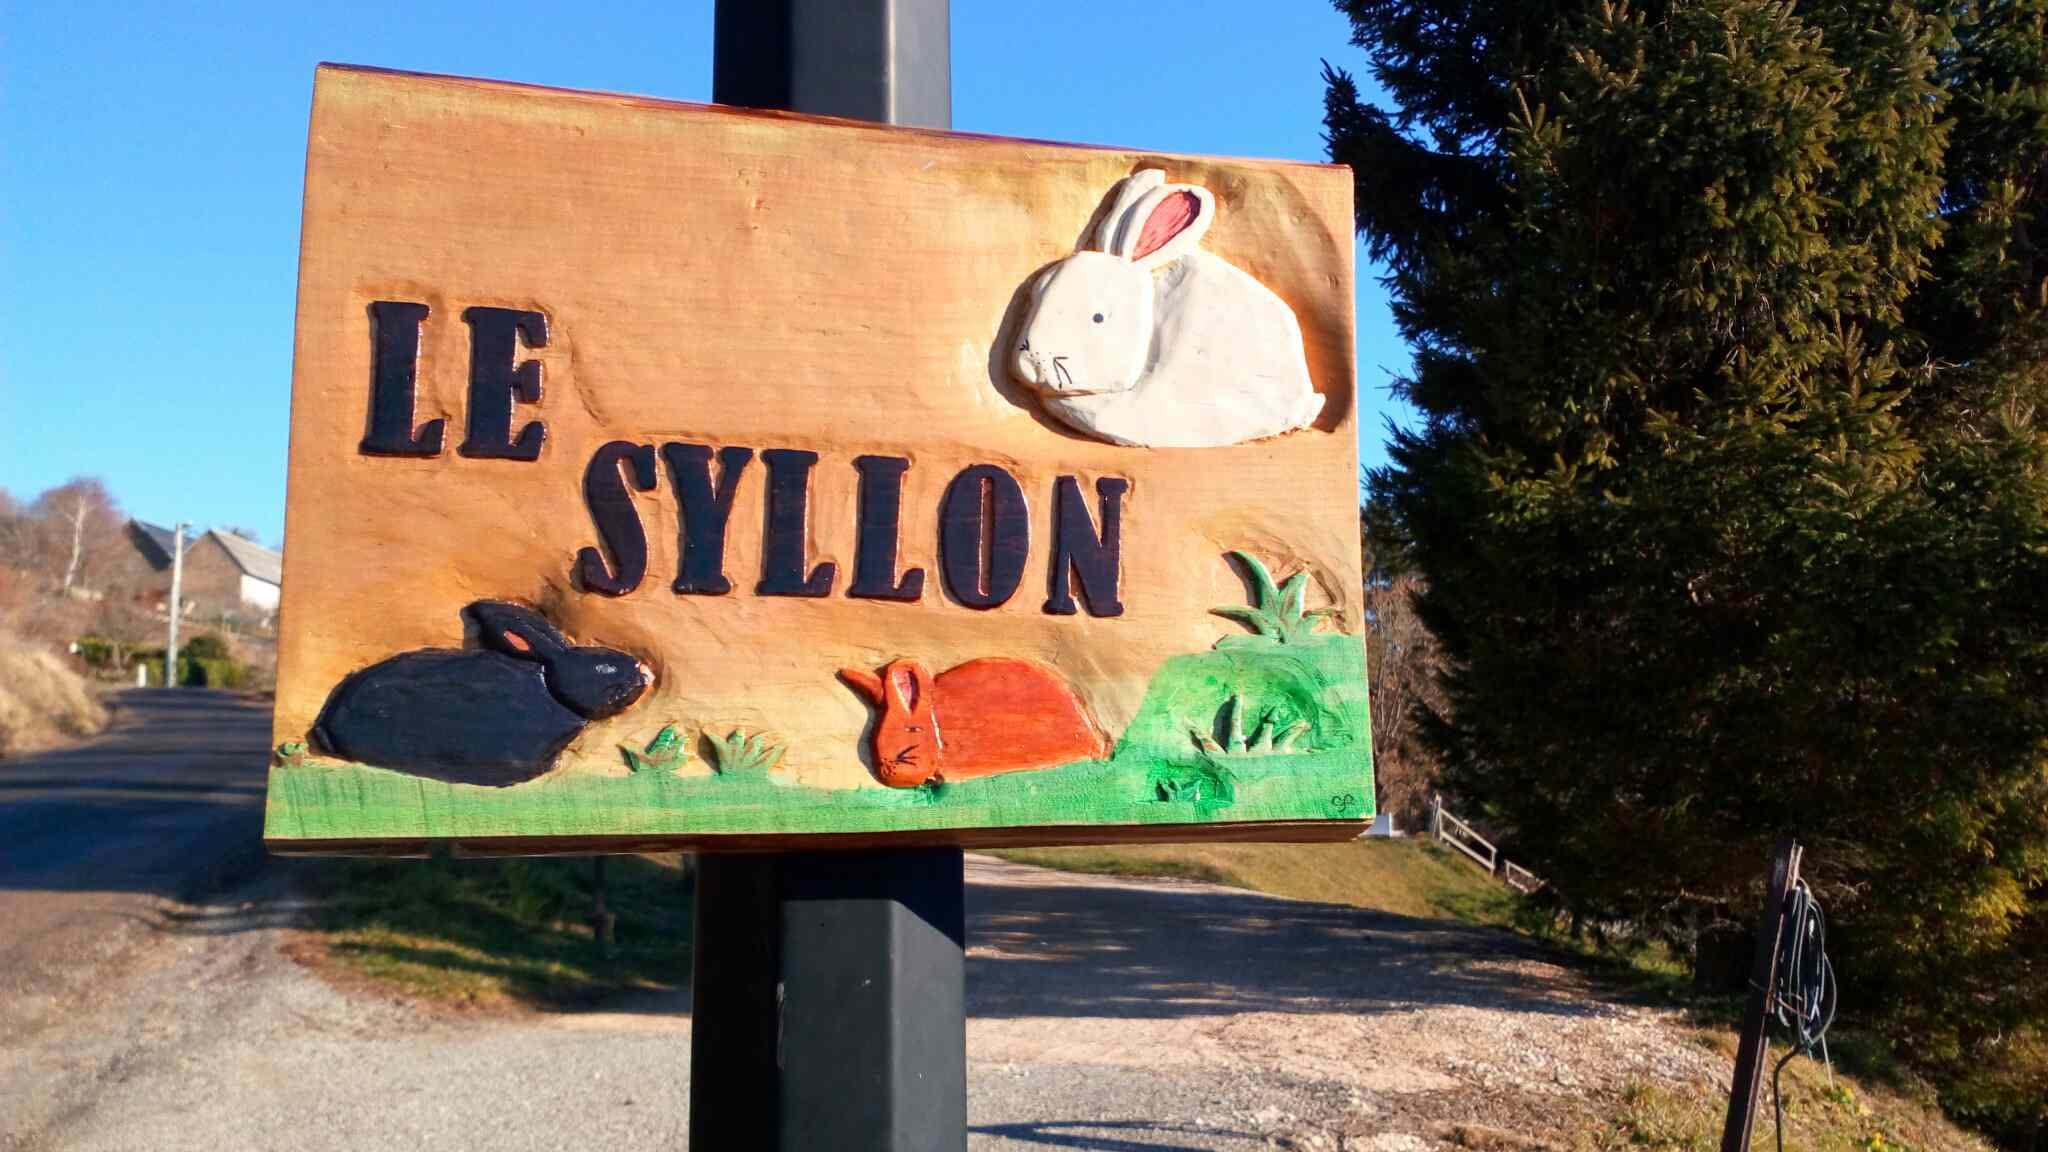 Le Syllon-All2.jpg